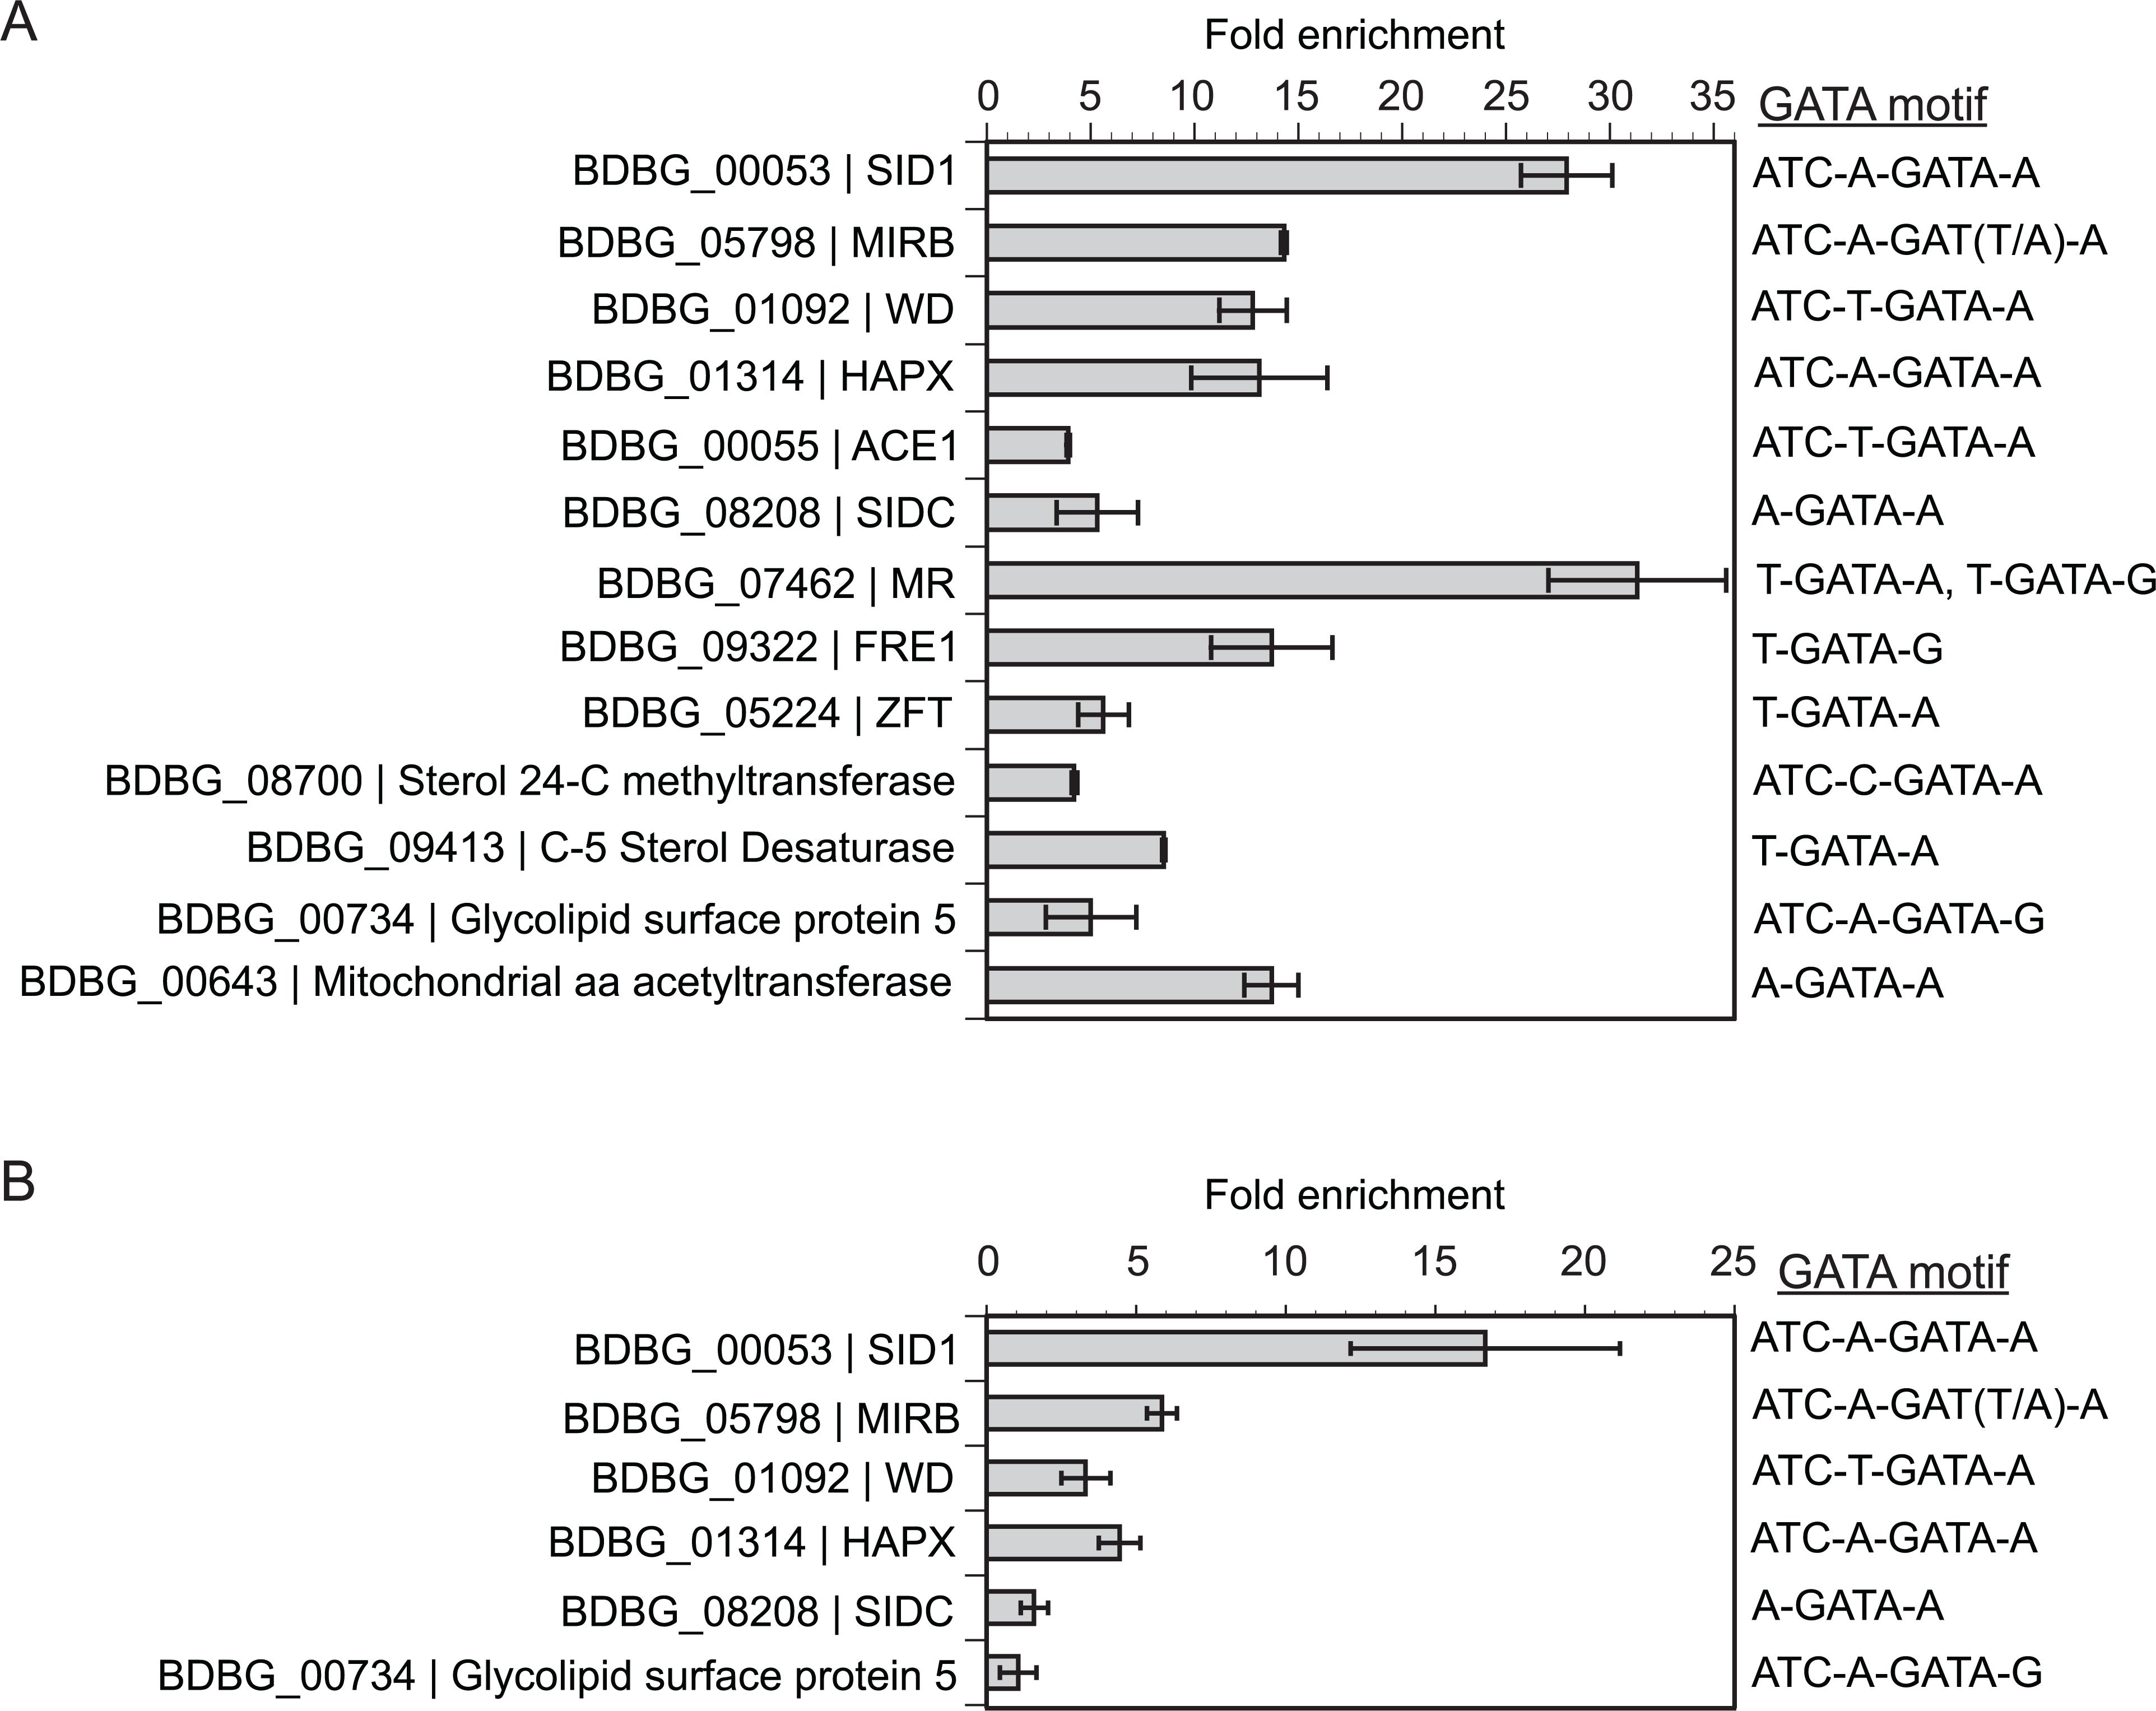 Chromatin immunoprecipitation with quantitative real-time PCR (ChIP-qPCR).